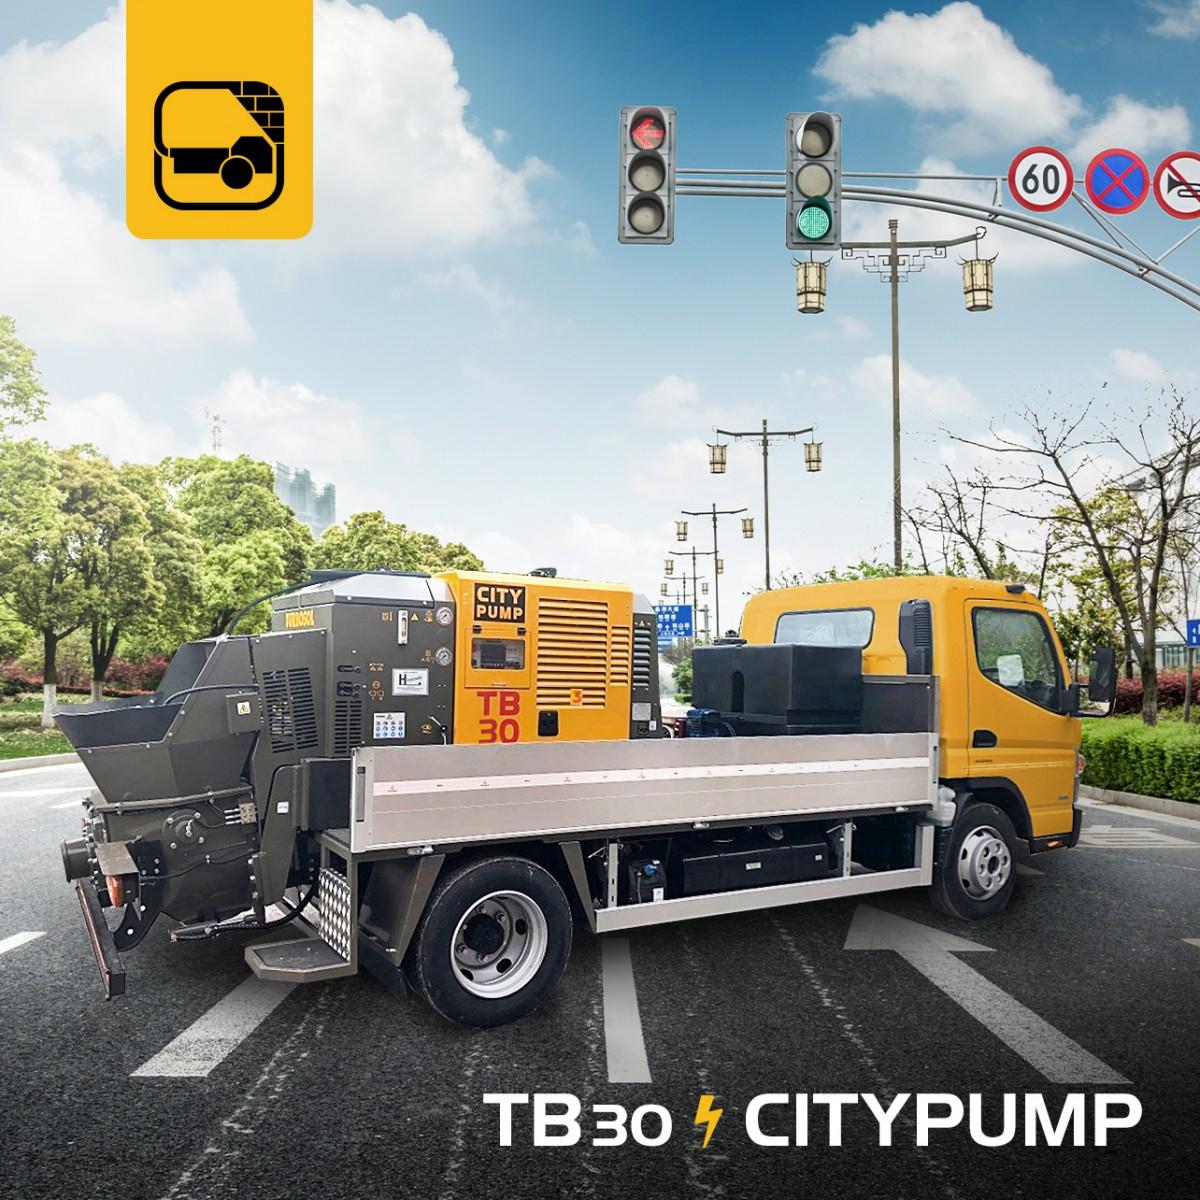 TB 30 Citypump